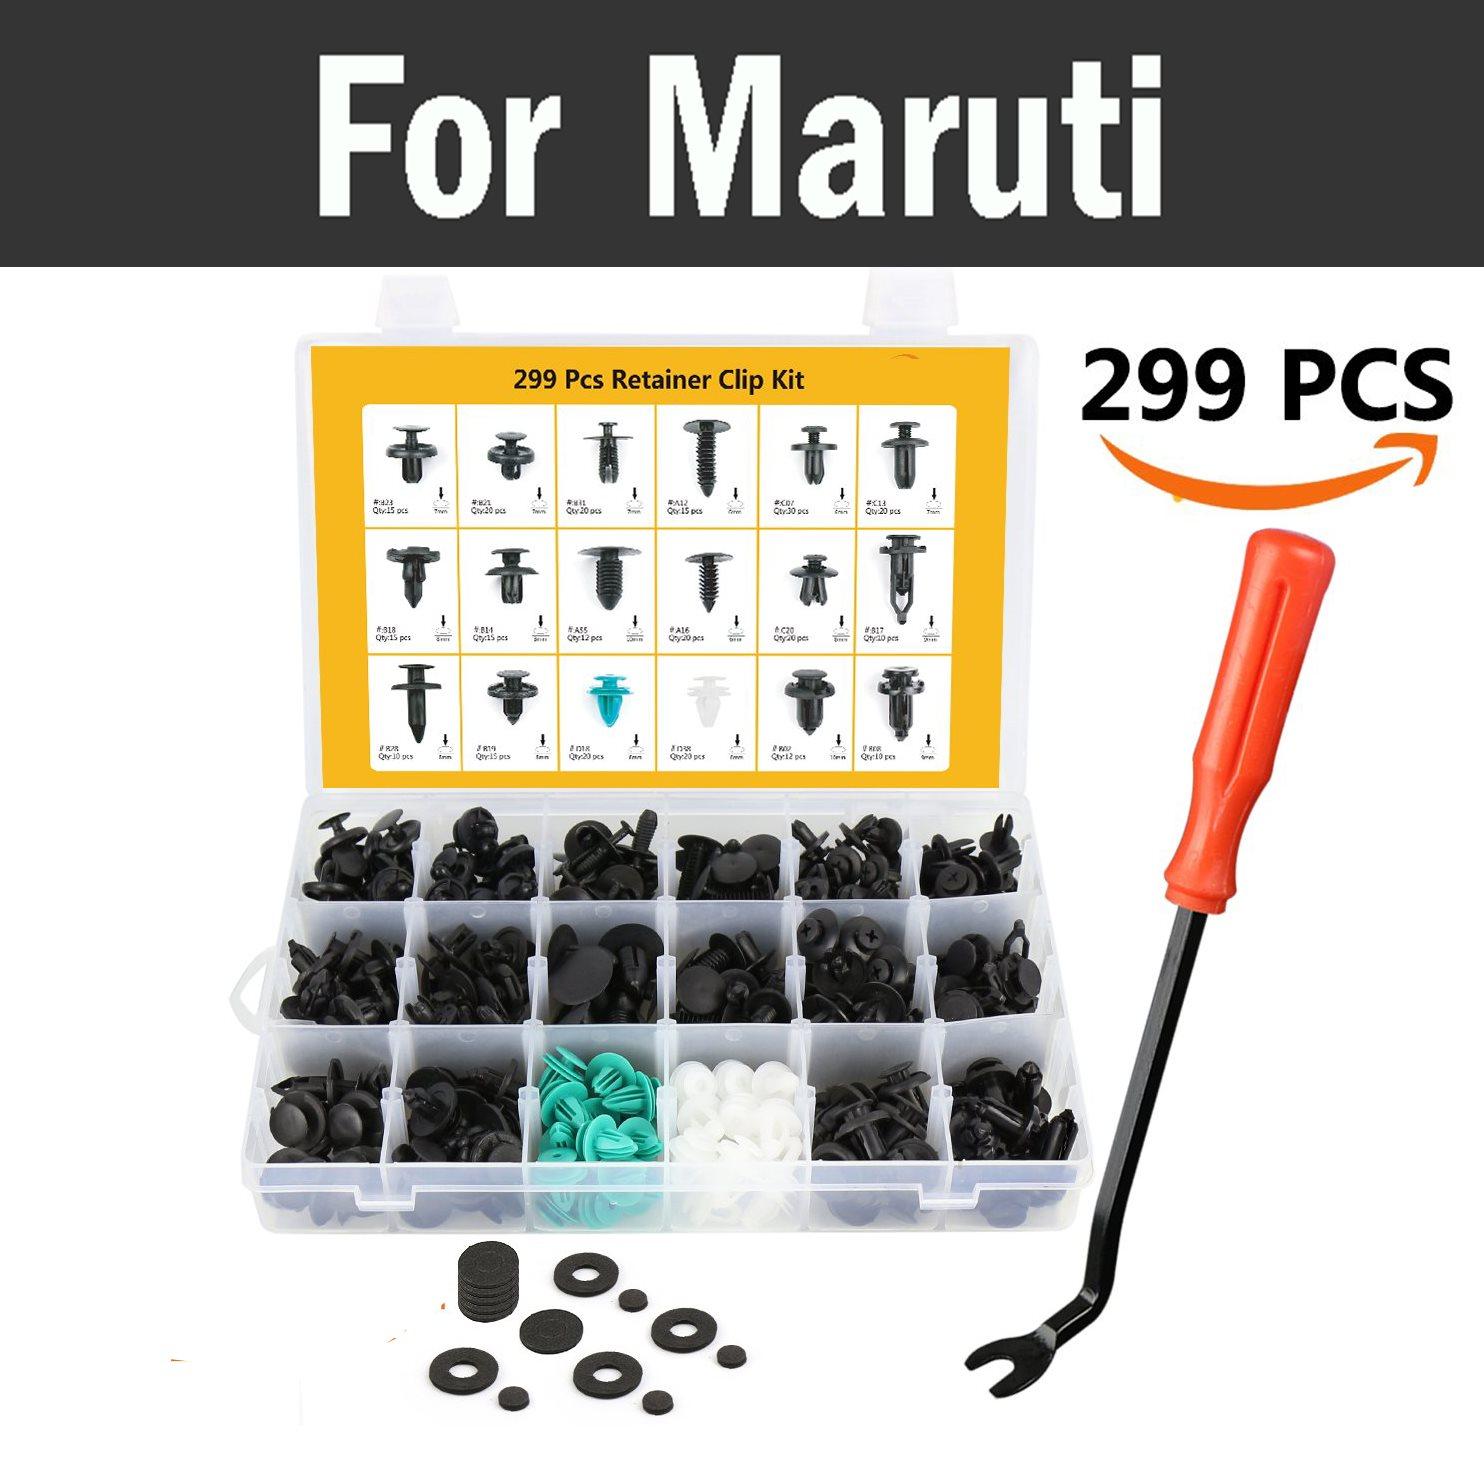 299pcs Car Retainer Kit Pliers Tool Trim Clips Rivets With Fastener Remover Rivets For Maruti 800 Alto Baleno Esteem Gypsy Zen